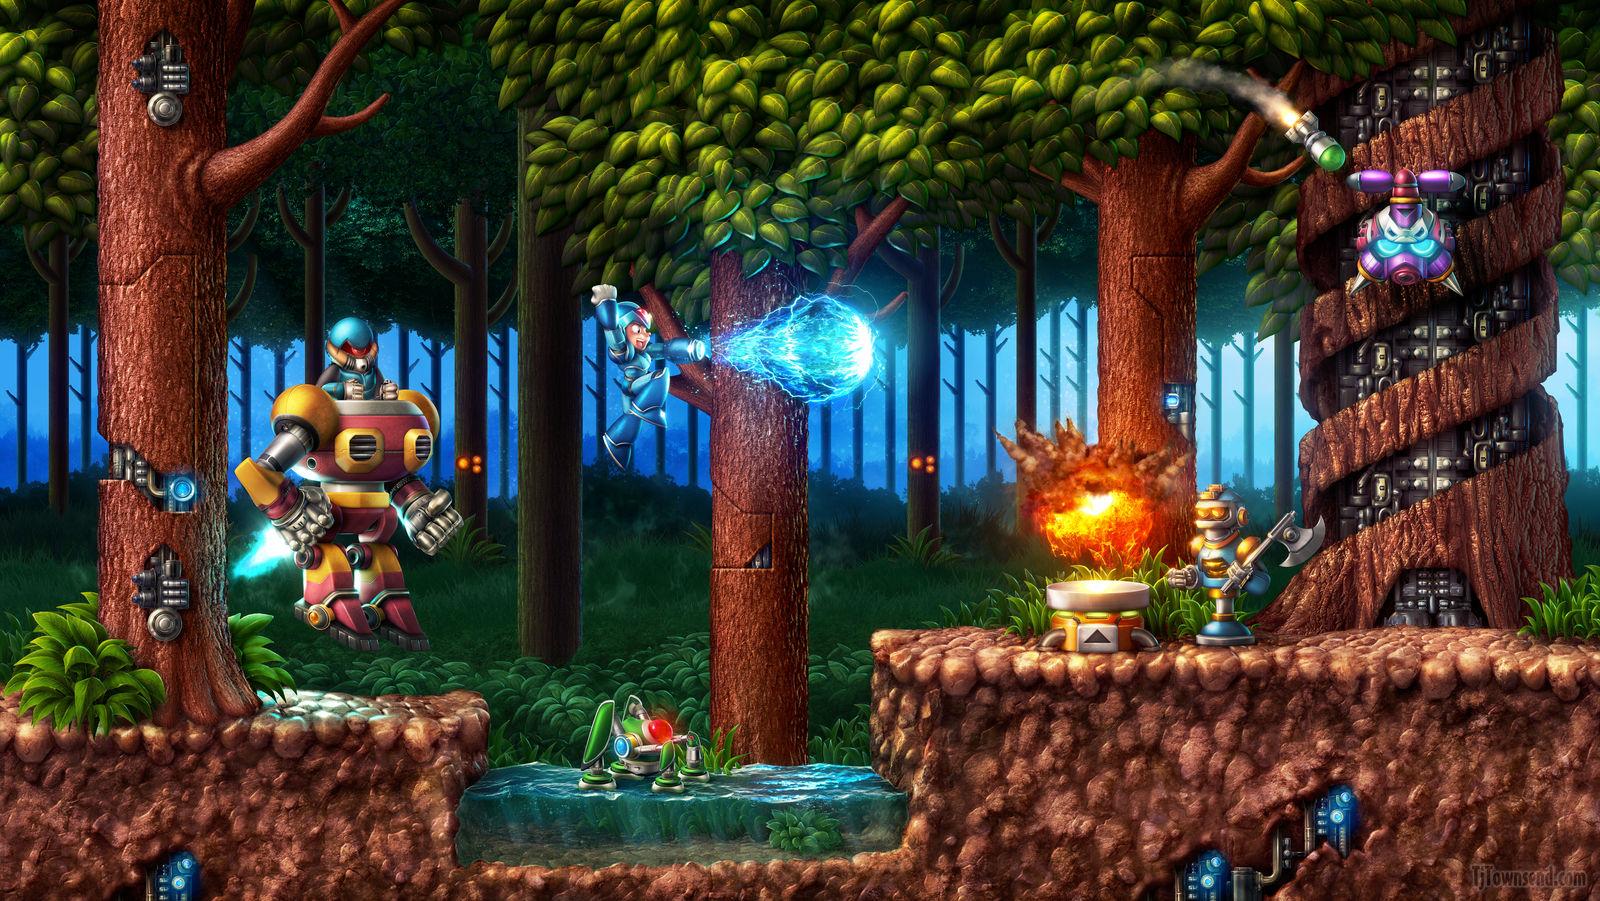 Mega Man X - Sting Chameleon's Stage by Elemental79